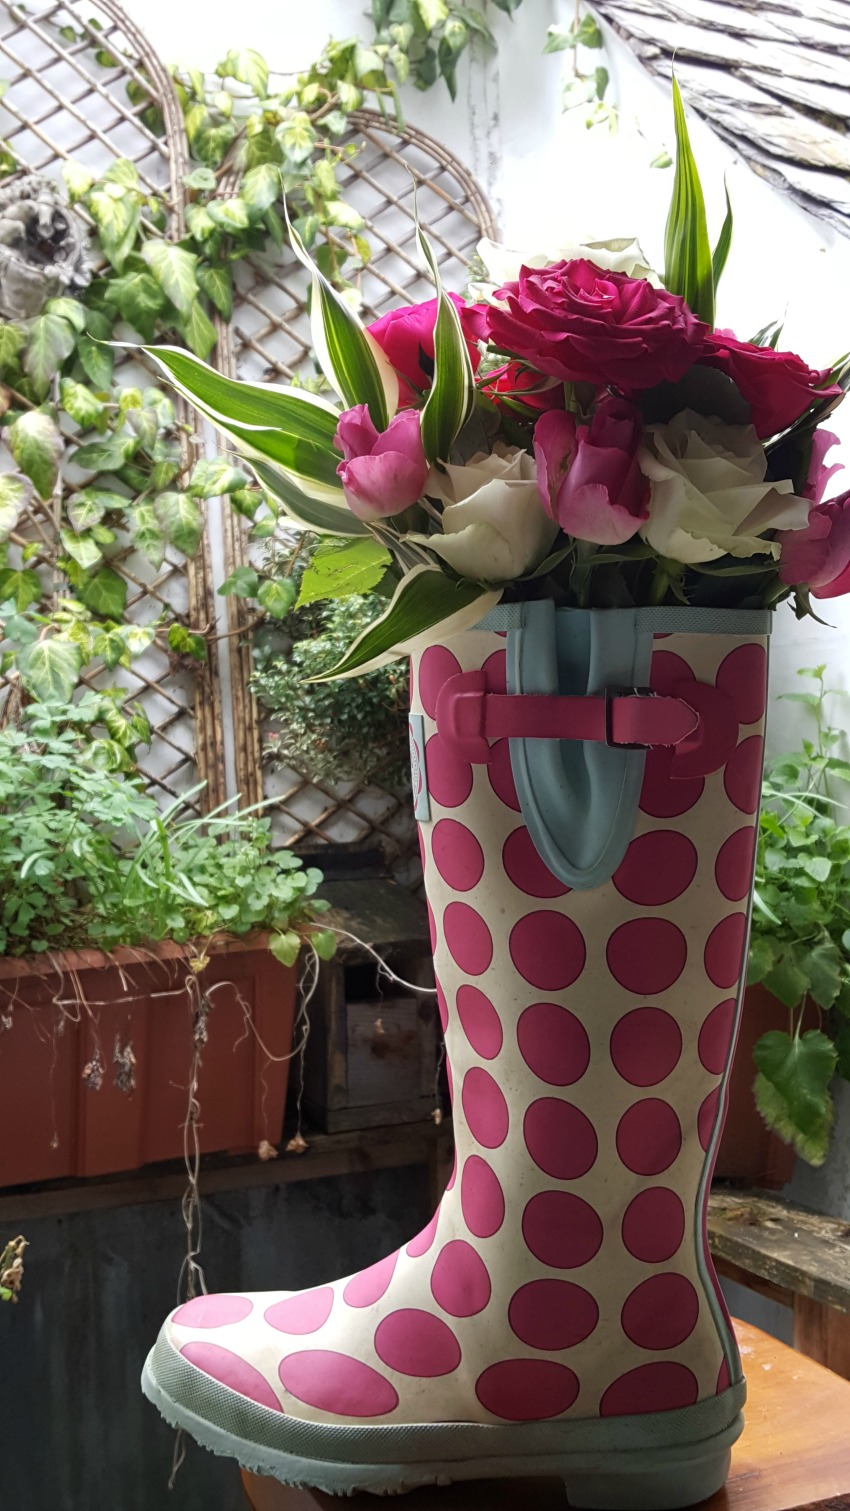 Scottish Festival Wedding - Welly Boot Flowers Idea